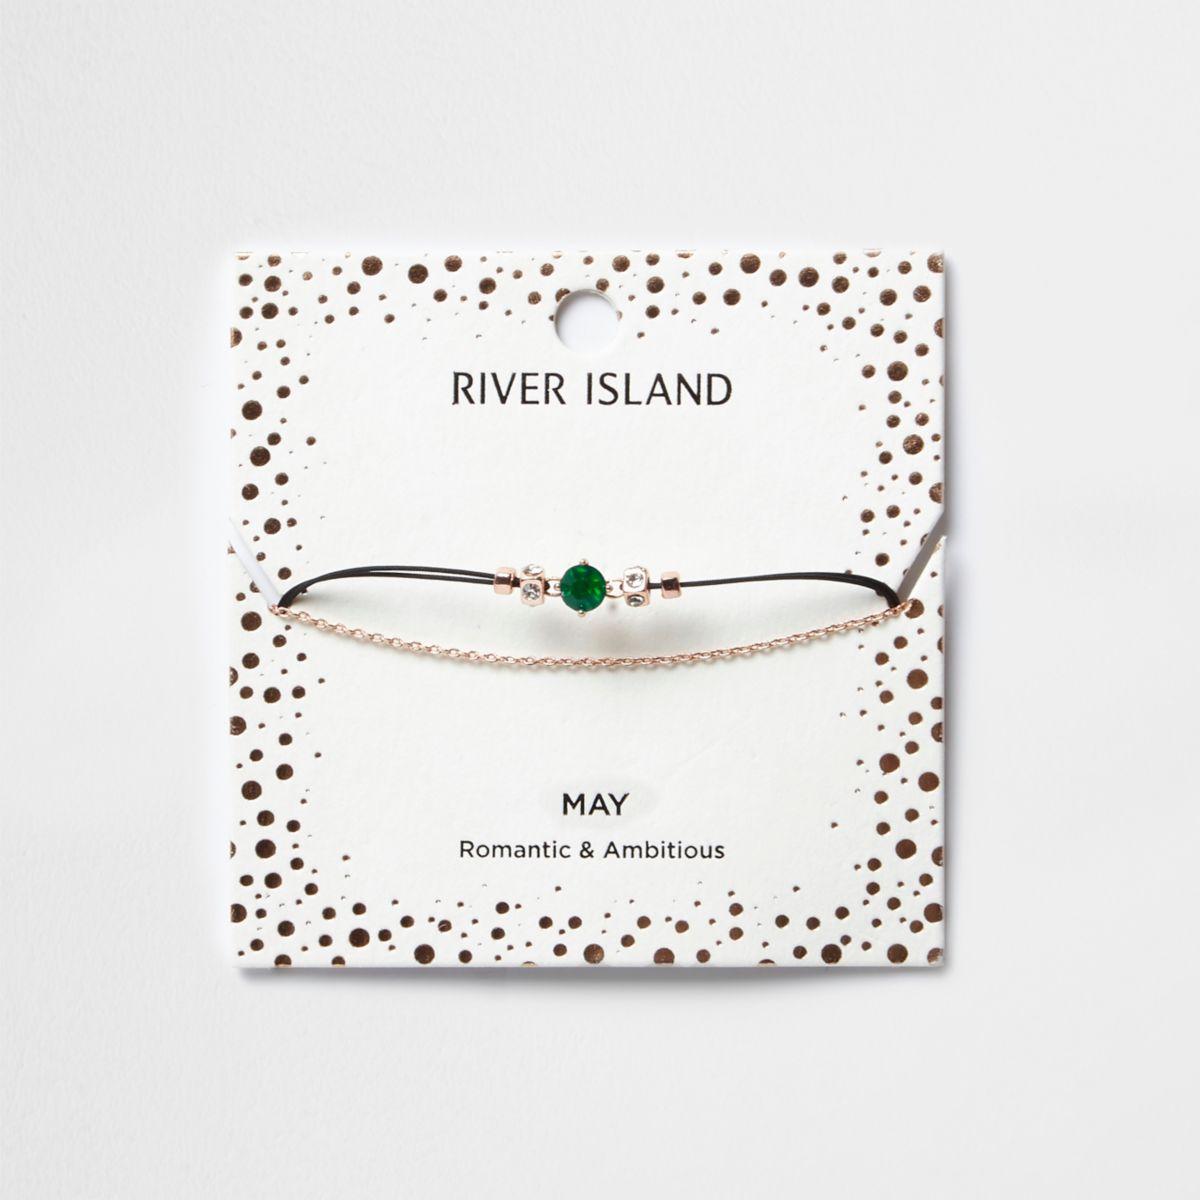 Green May birthstone chain bracelet